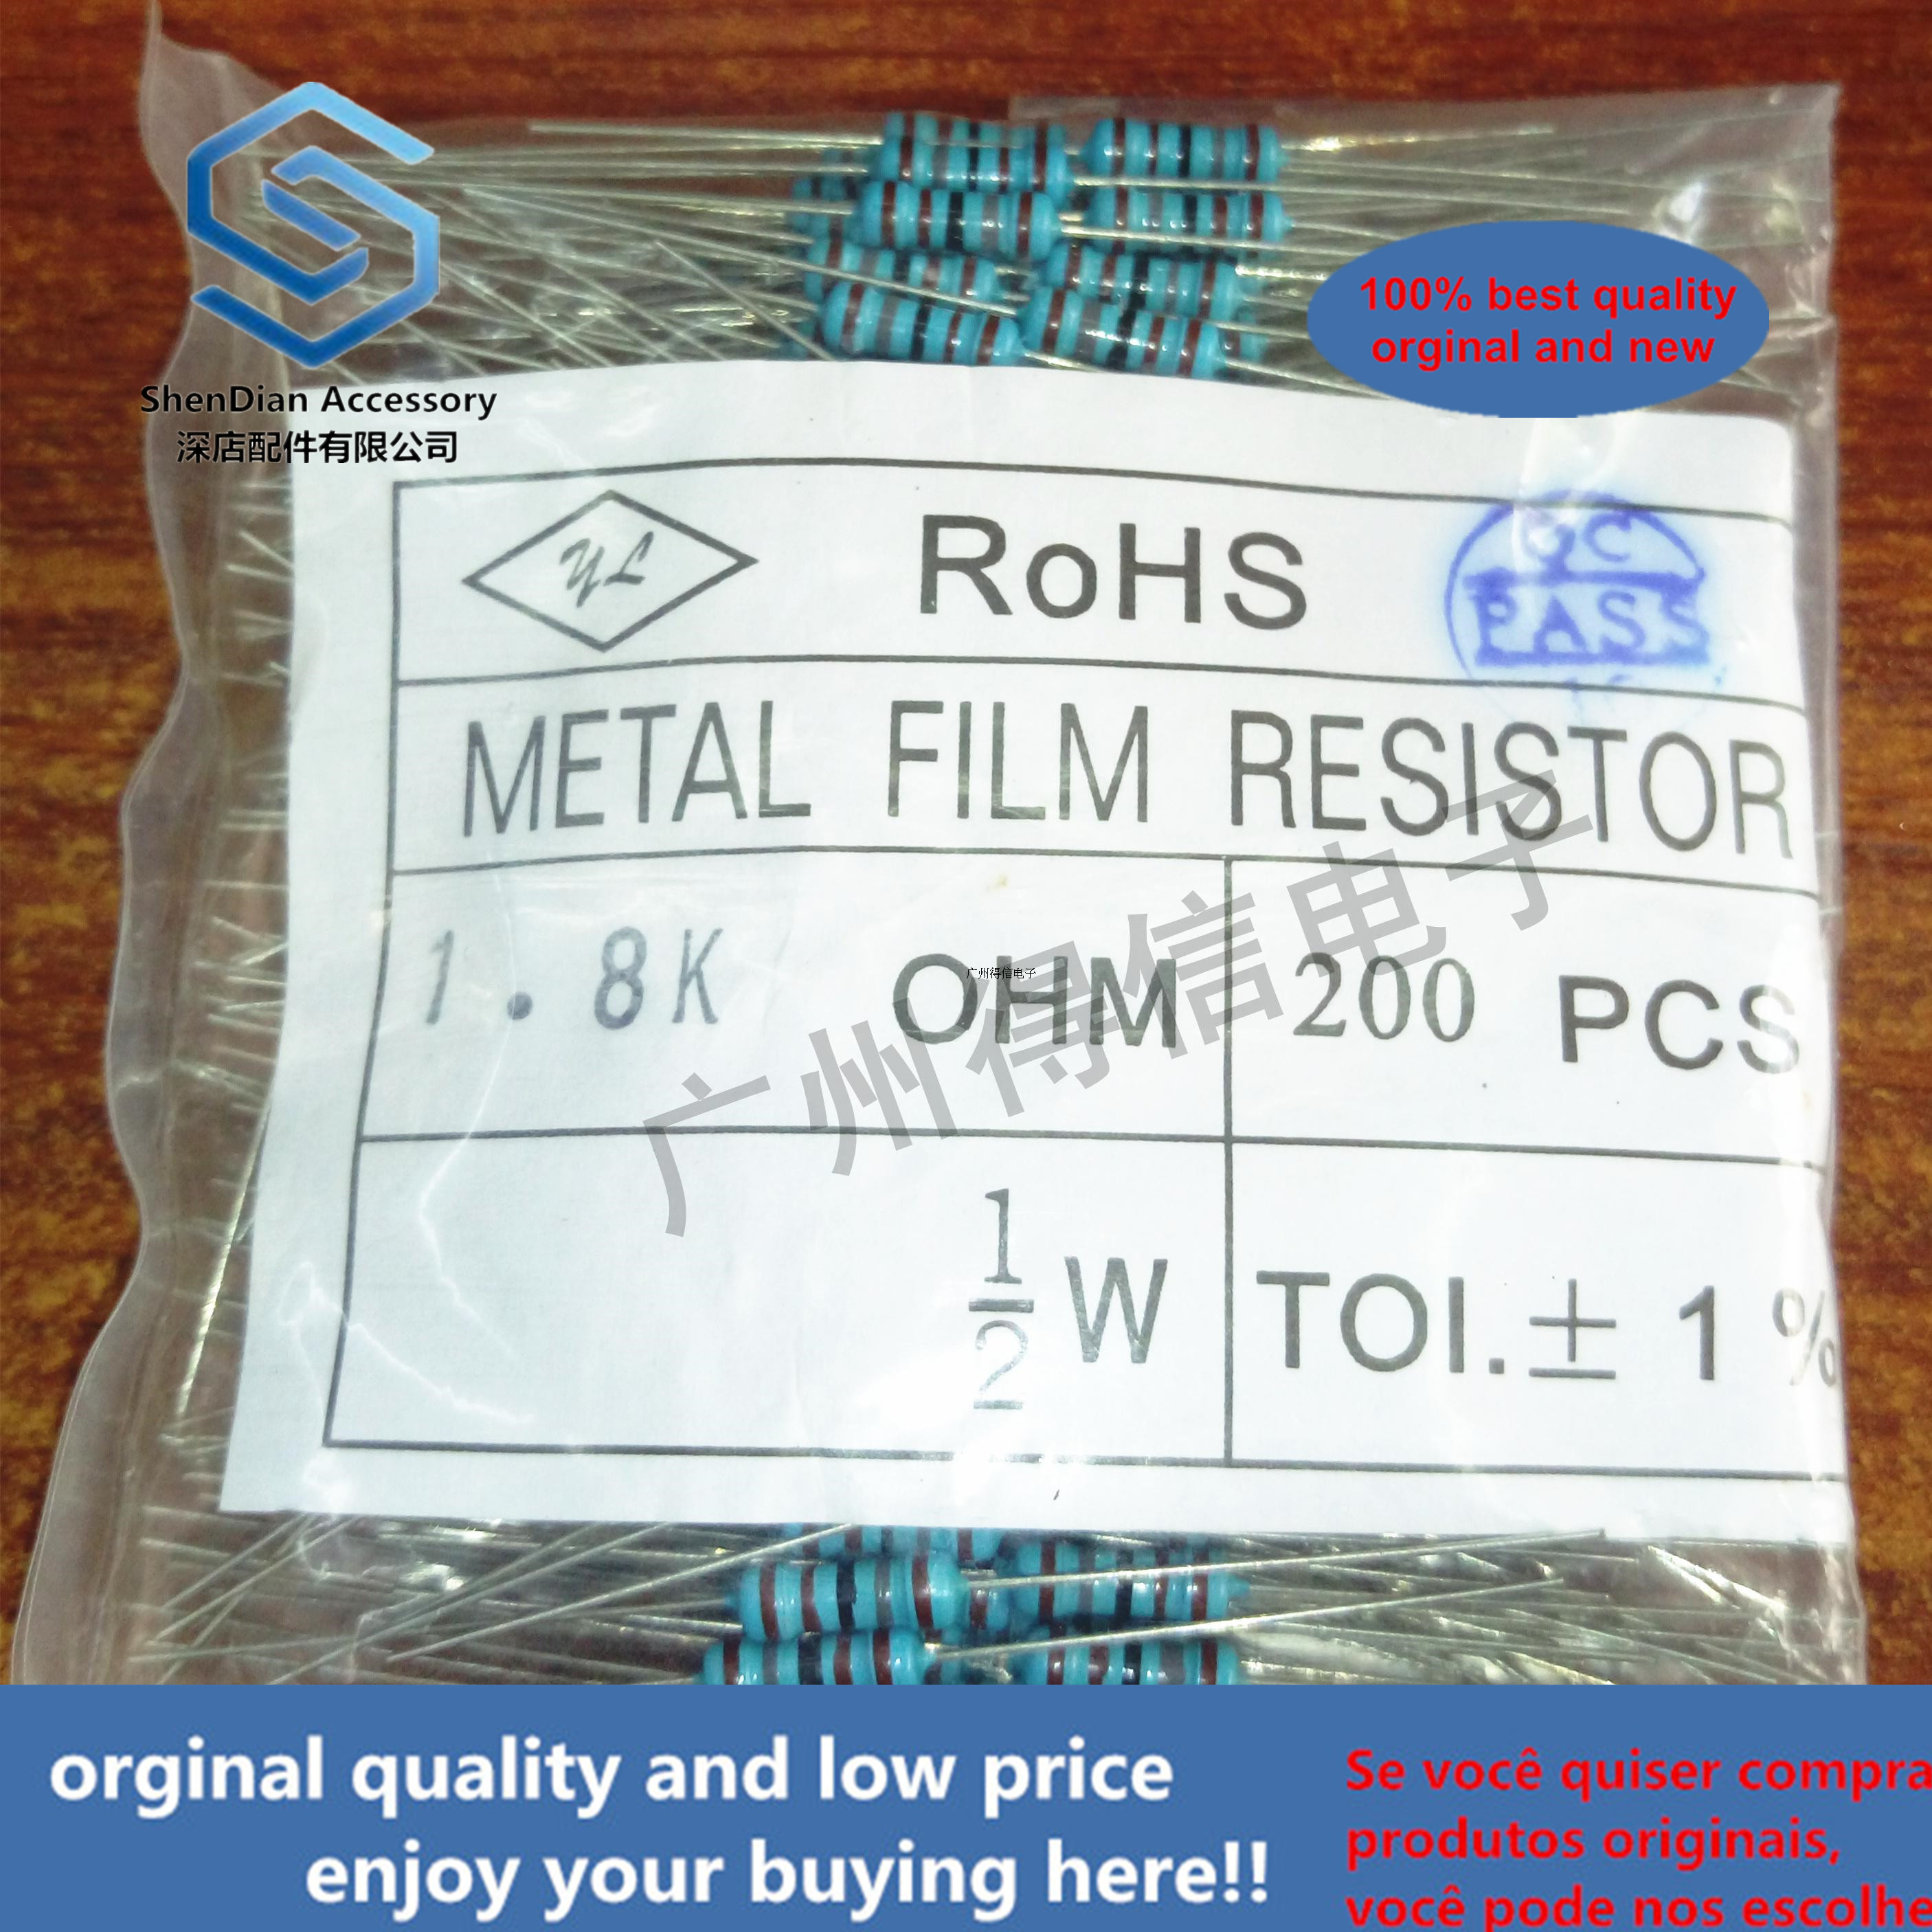 200pcs 1 / 2W 560K 1% Brand New Metal Film Iron Feet Resistor Bag 200 Pcs Per Pack